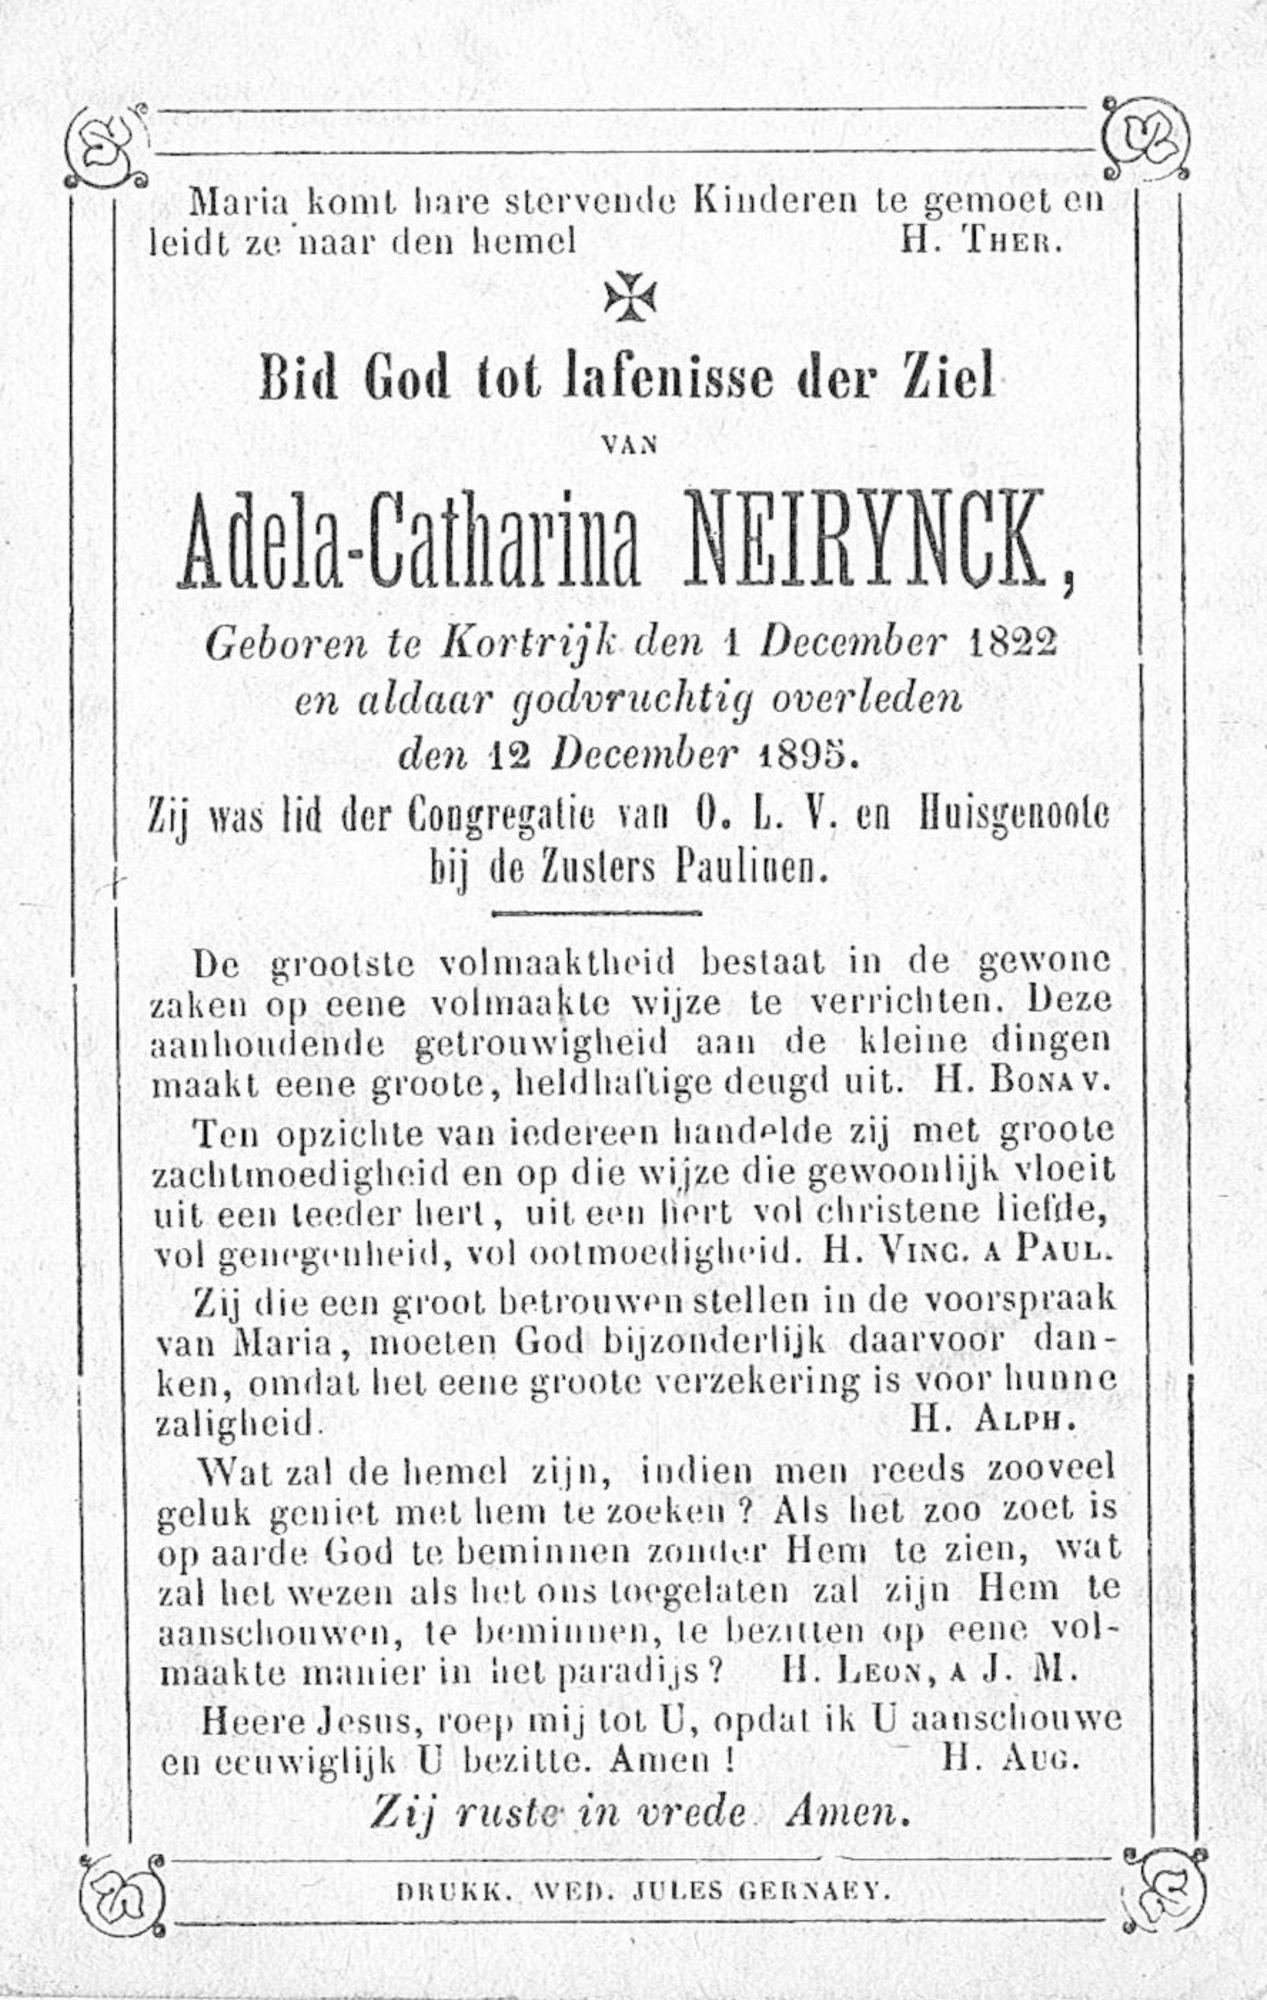 Adela-Catharina Neirynck